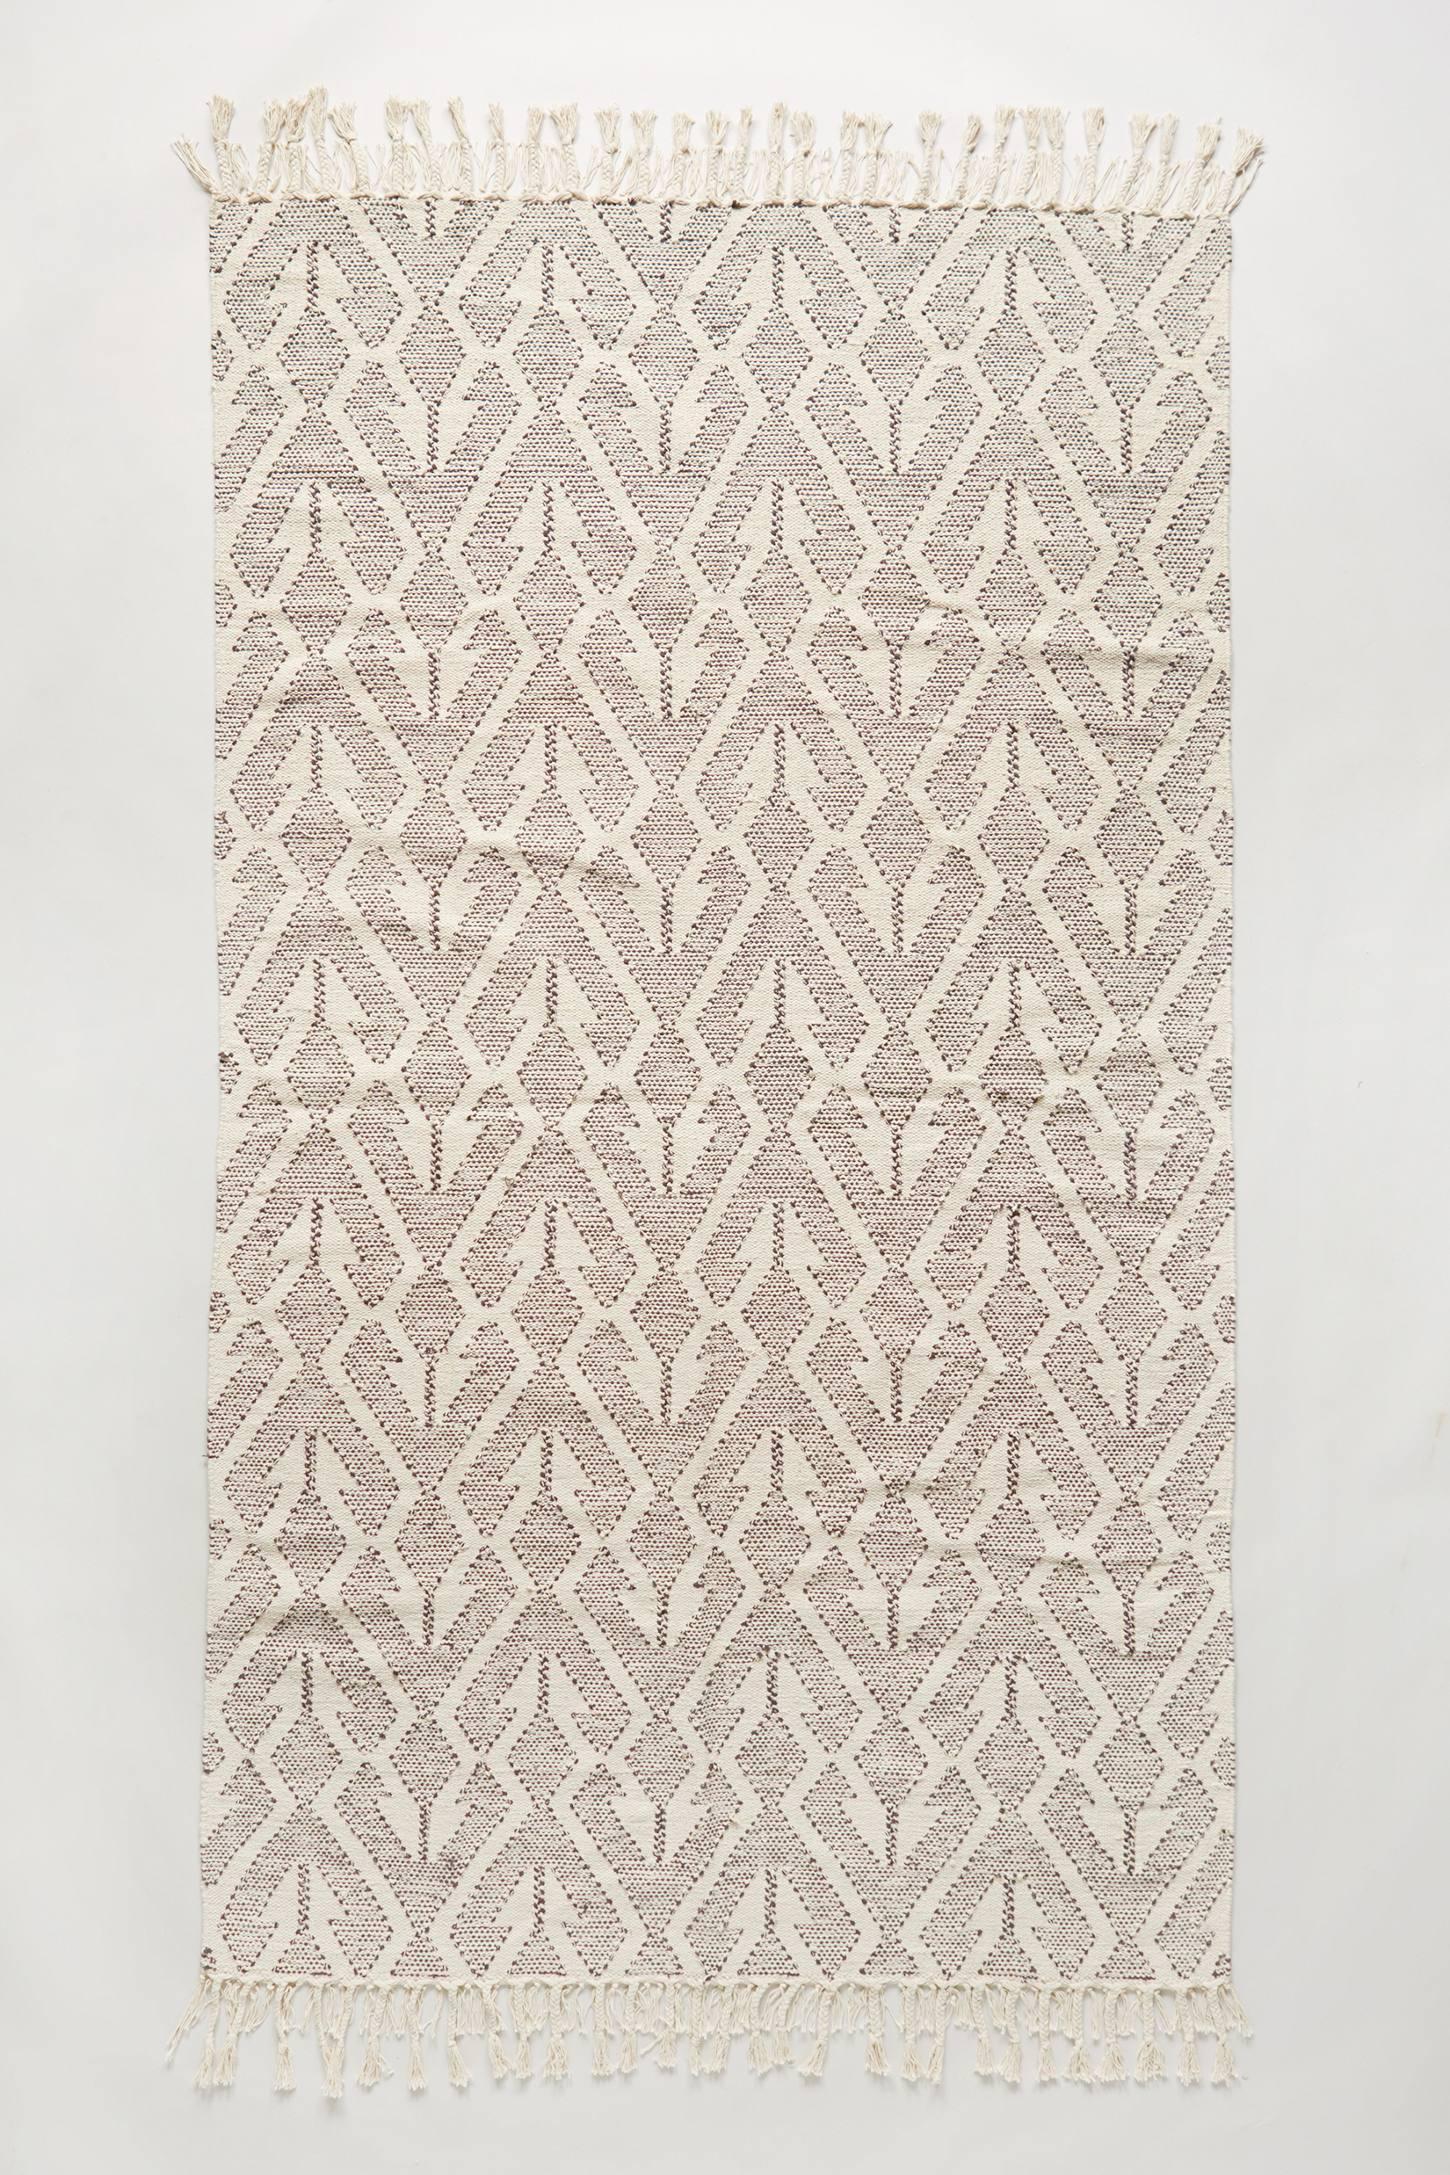 Herald Flat-Woven Rug